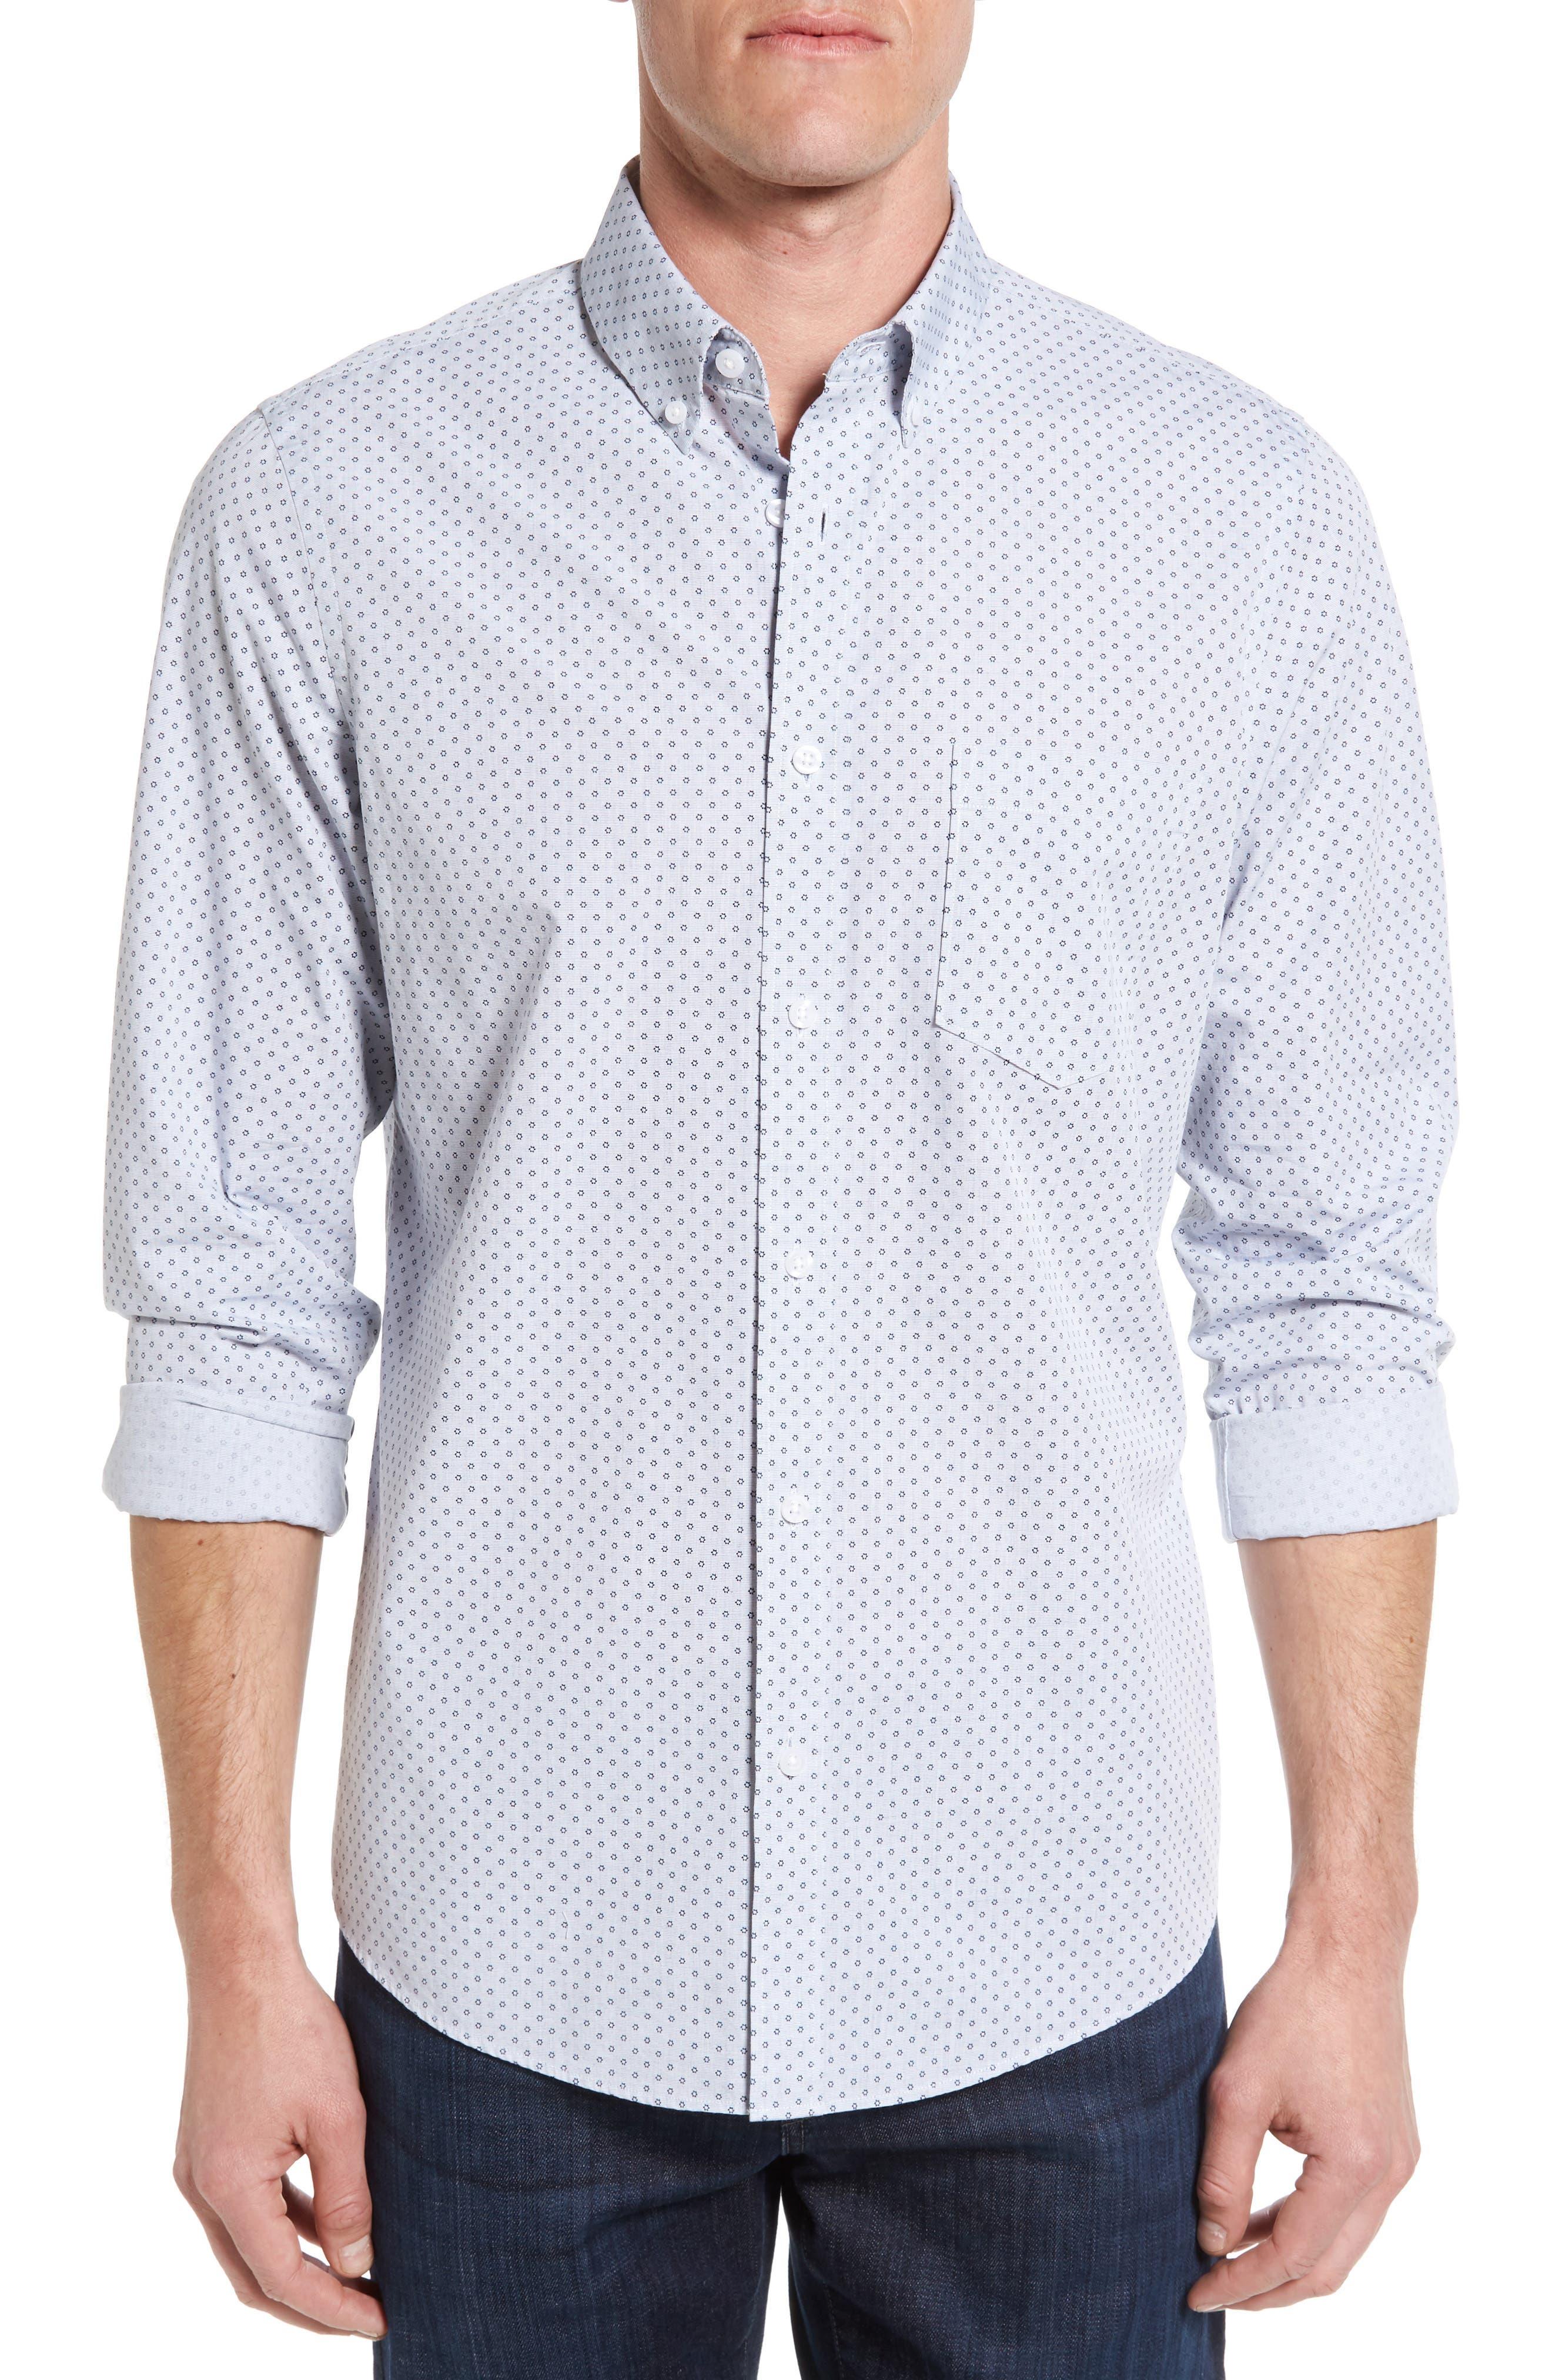 Nordstrom Men's Shop Slim Fit Print Sport Shirt (Regular & Tall)